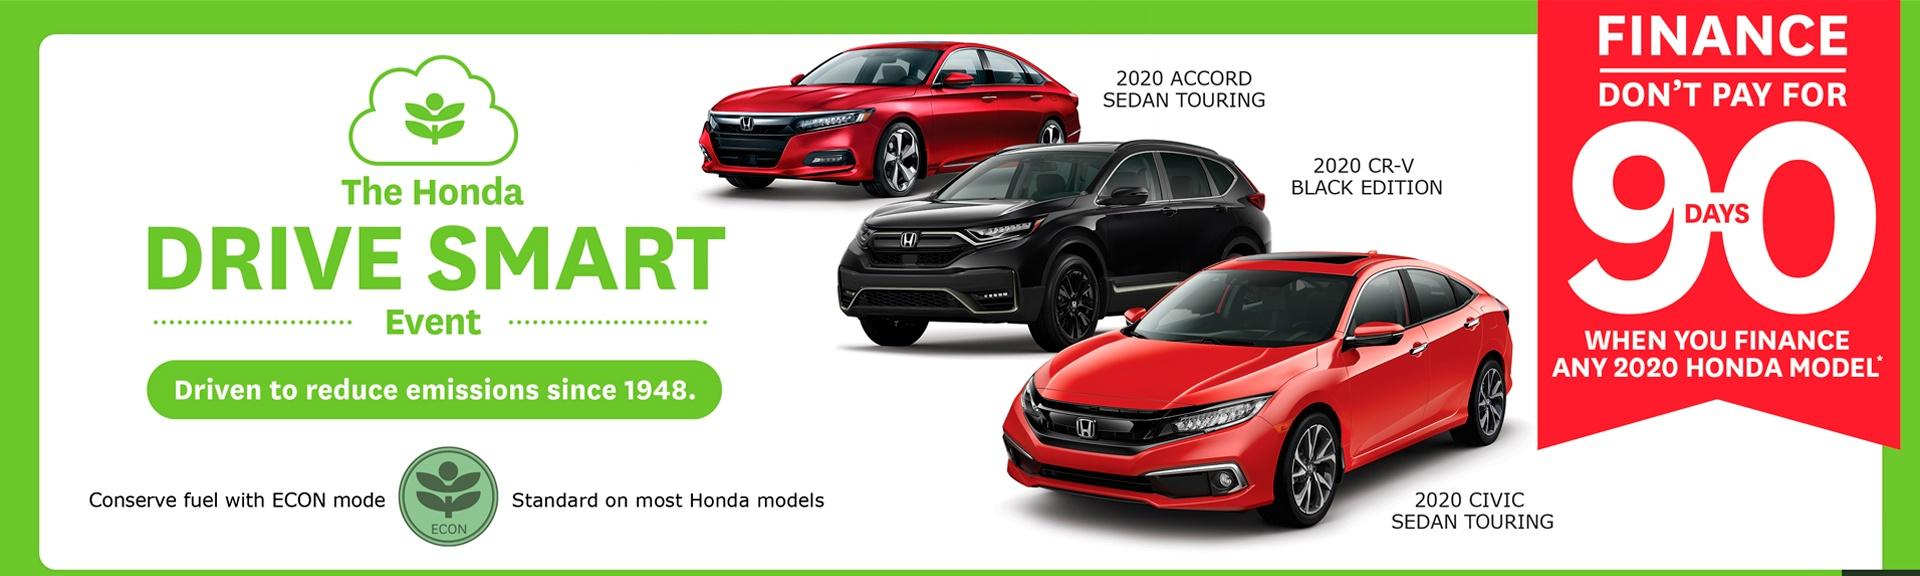 Honda-90Days-no-payment